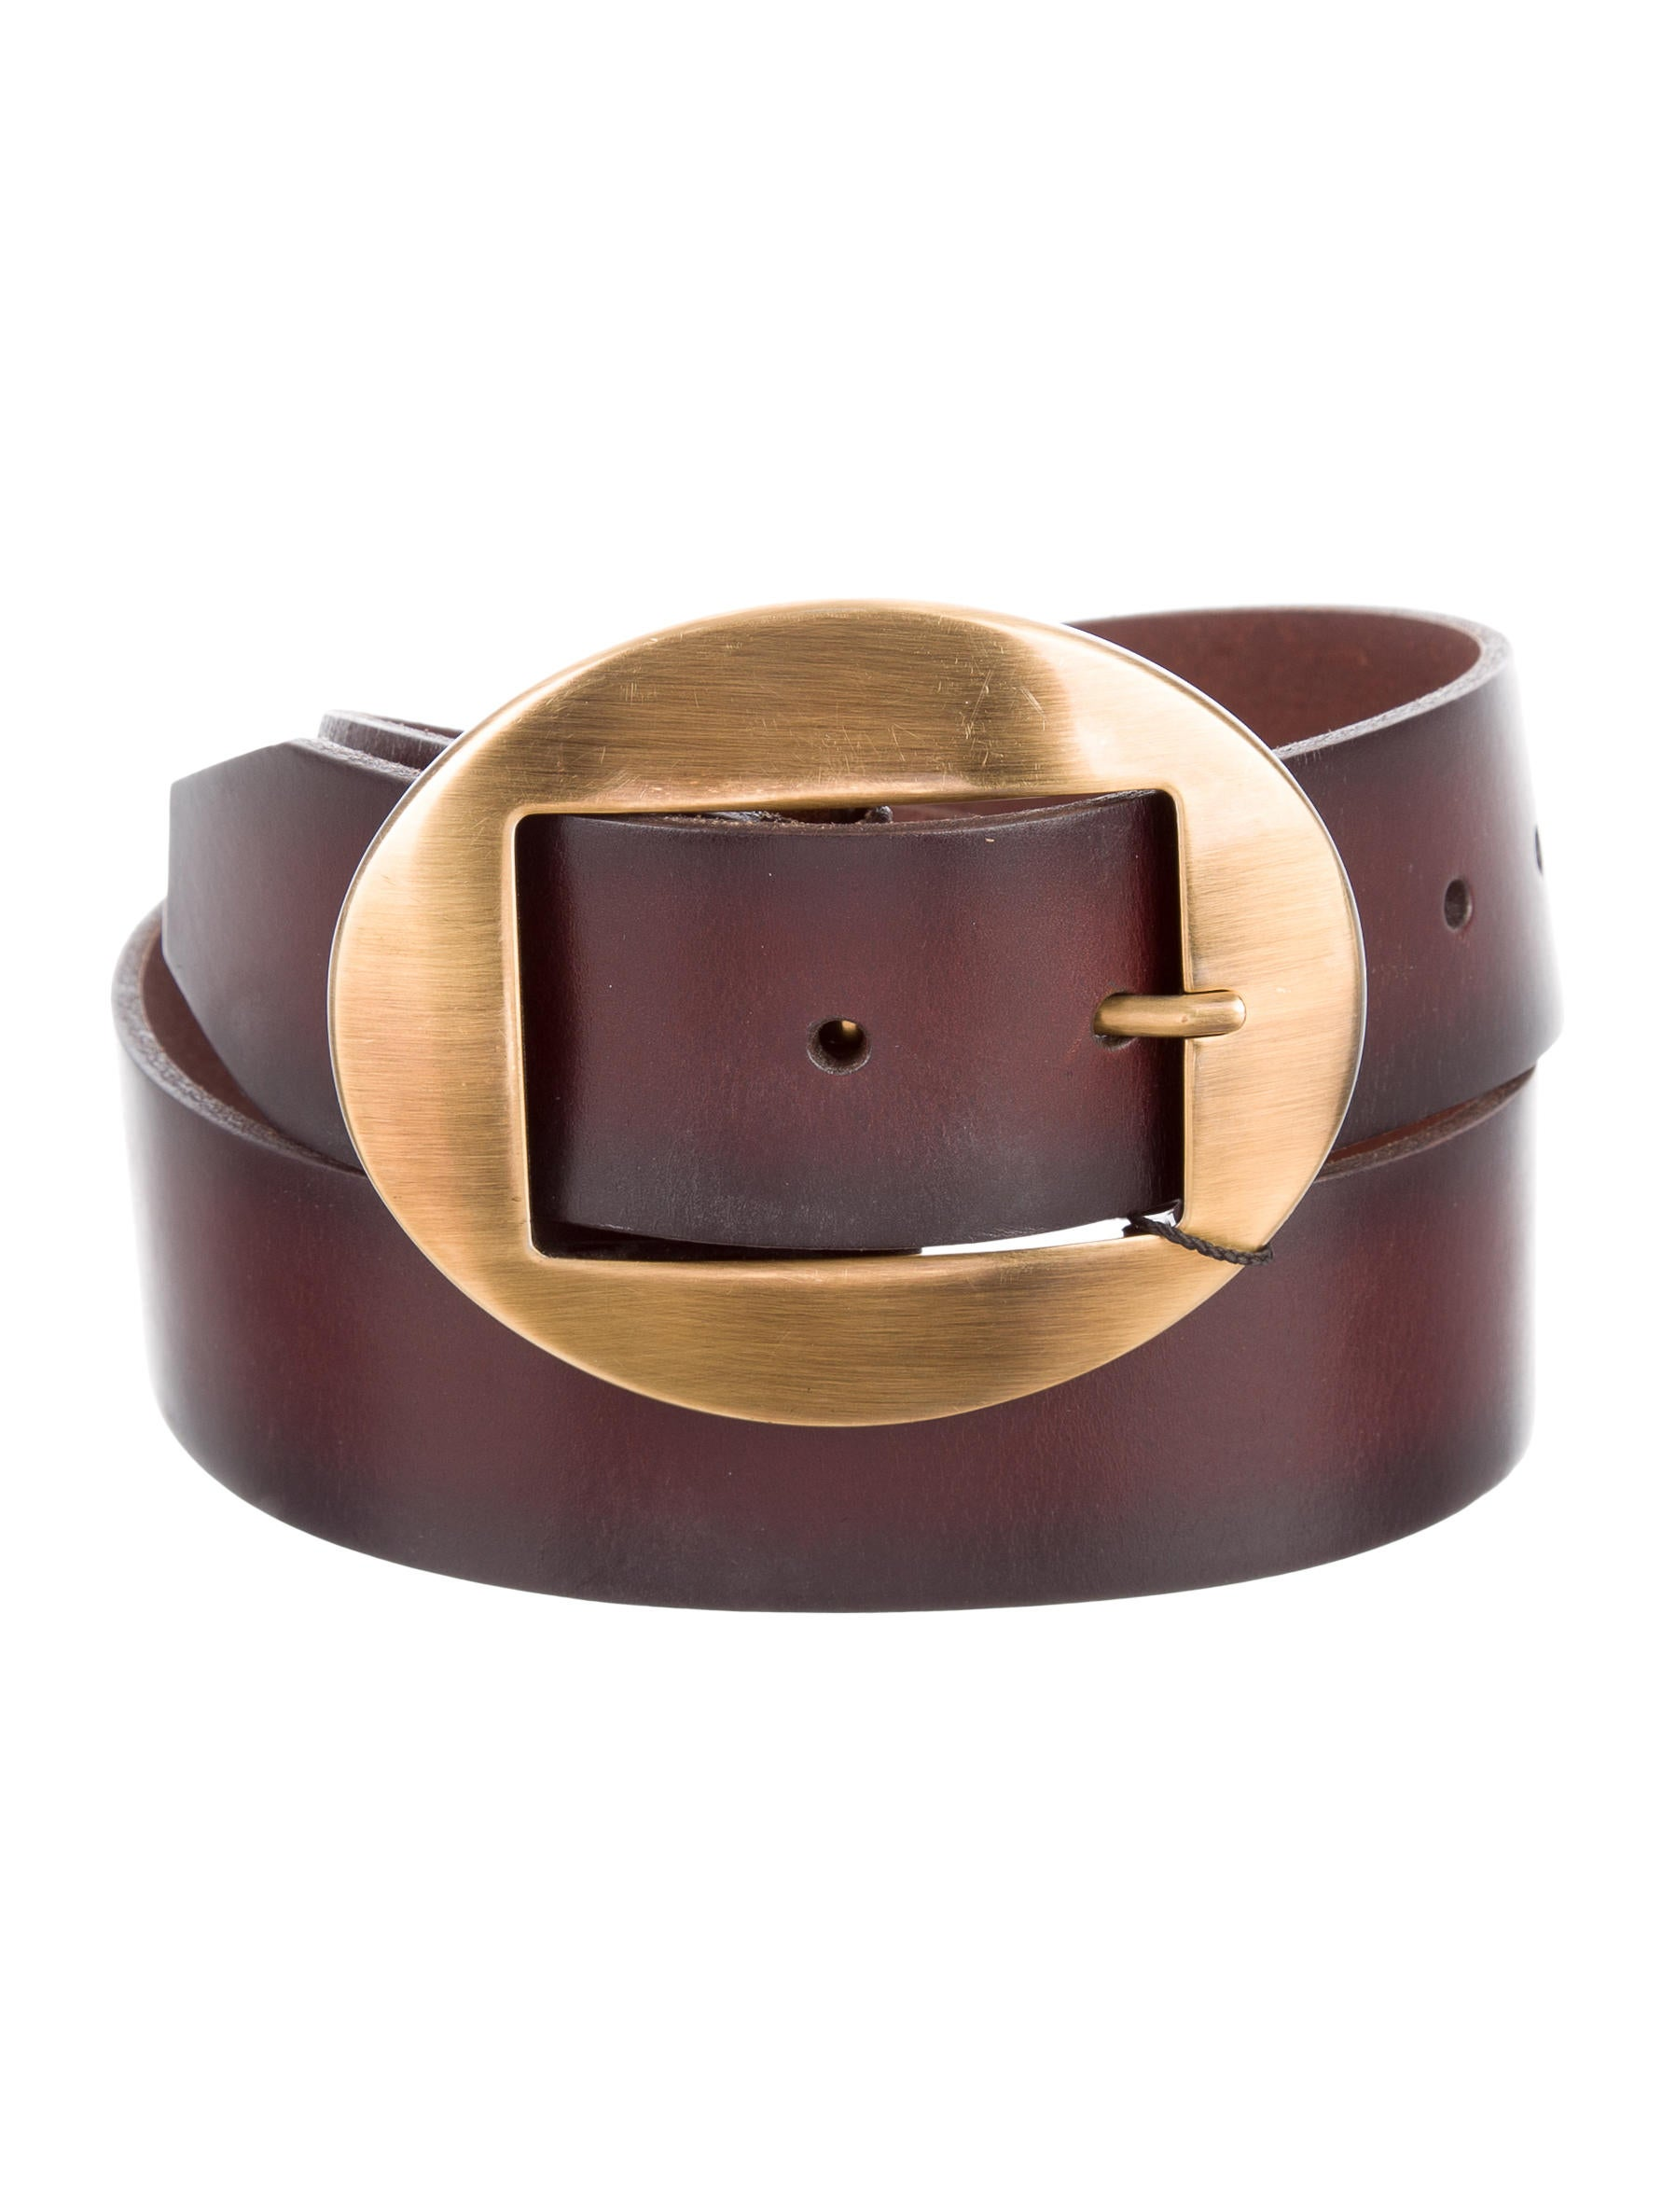 dolce gabbana leather buckle belt accessories